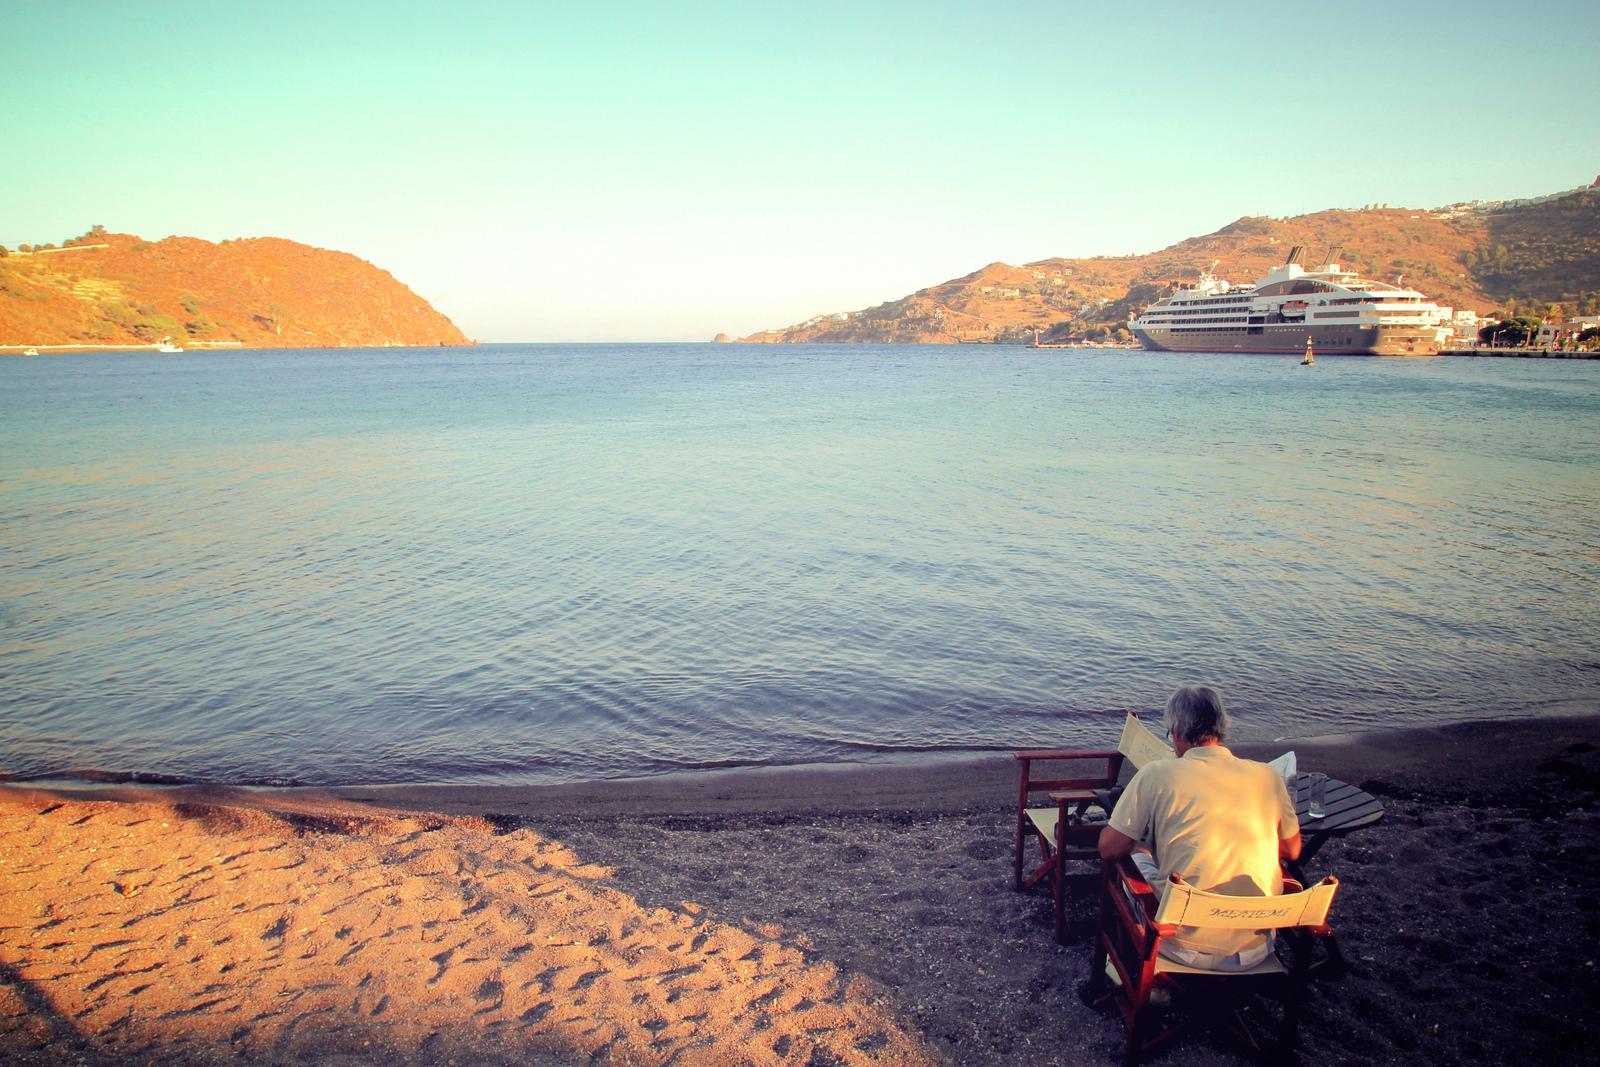 Patmos - Paul D'Ambra/flickr